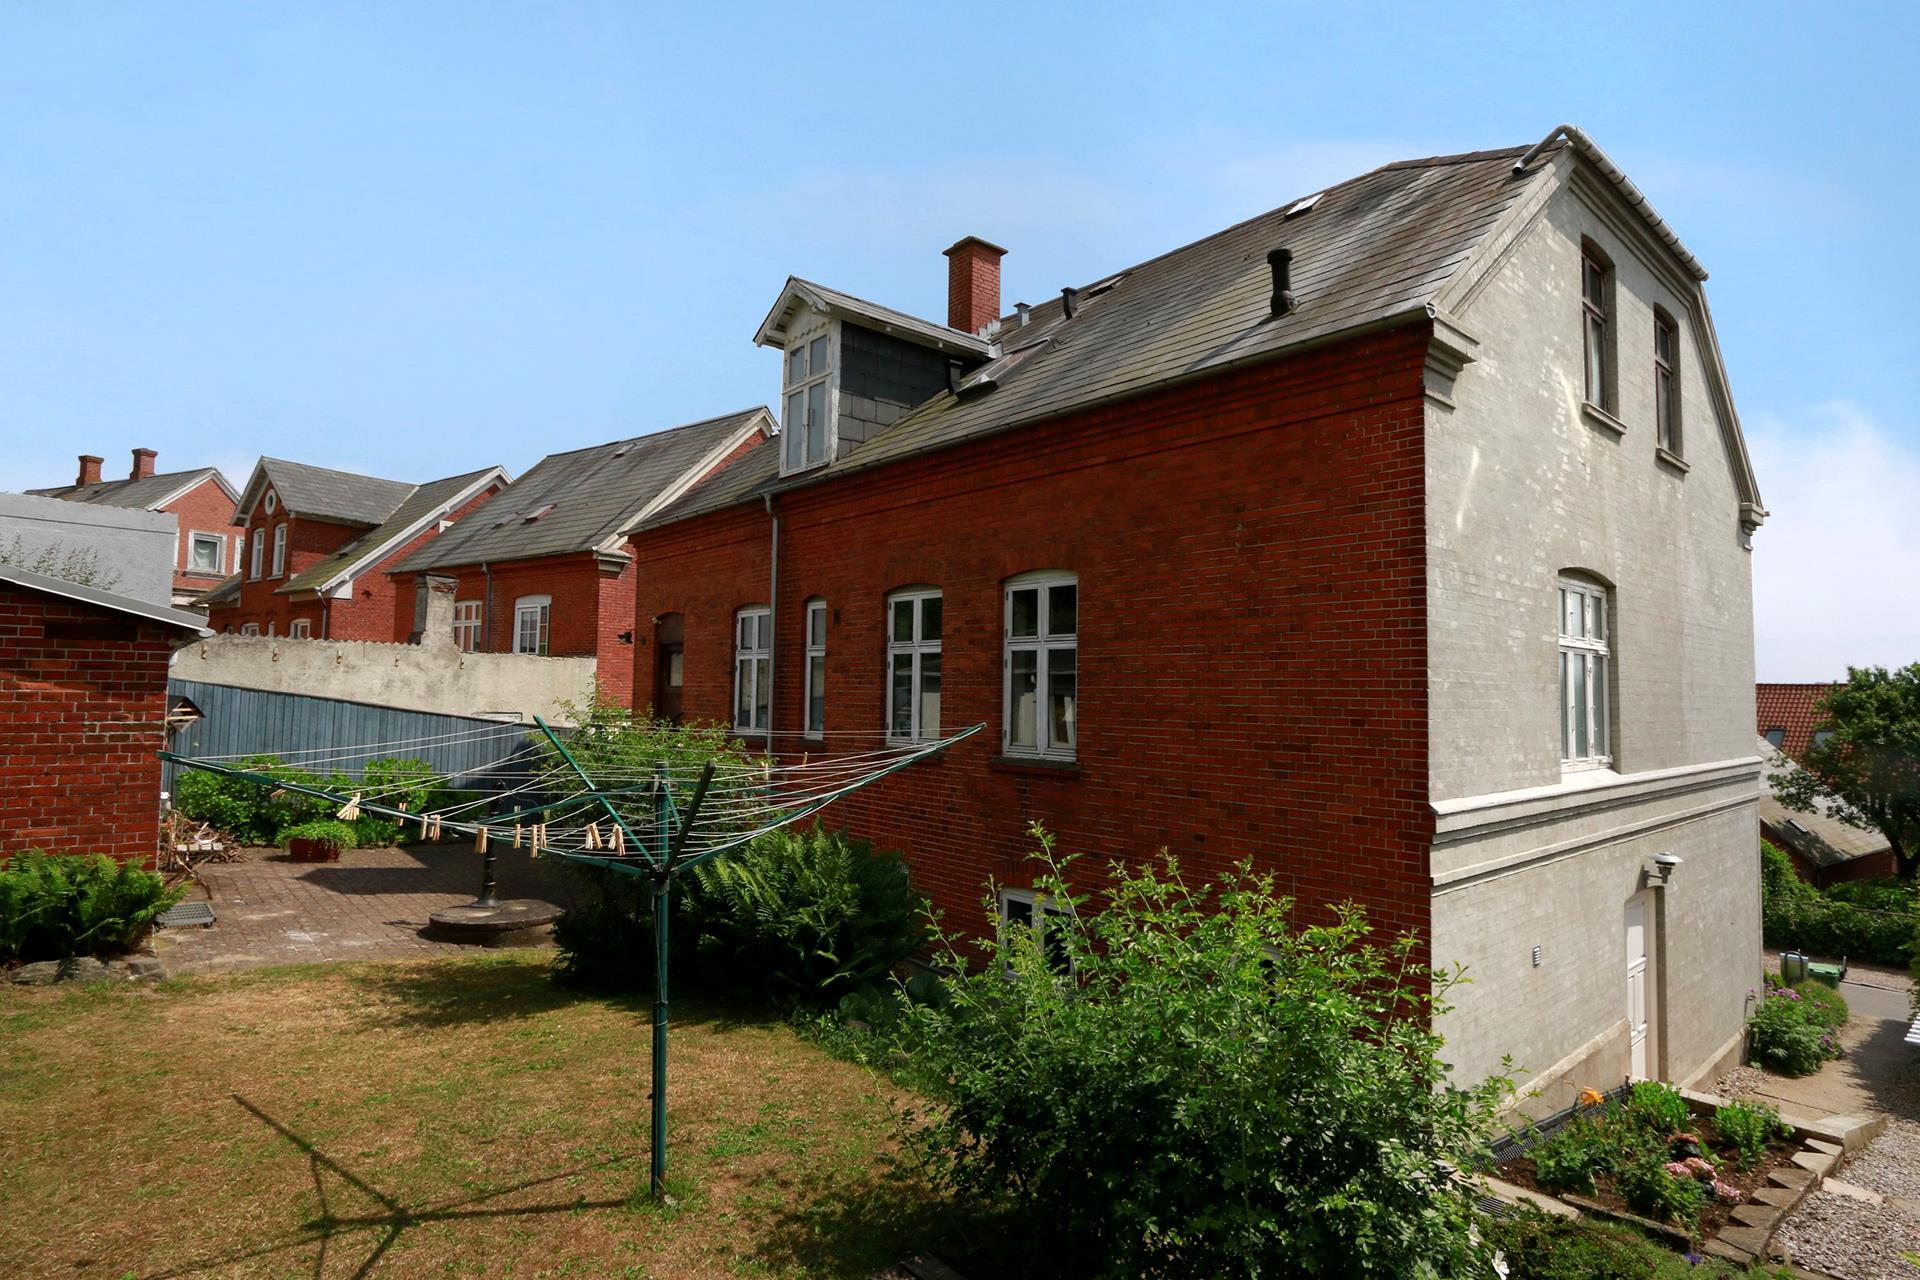 Boligudlejning på Albechsvej i Svendborg - Have